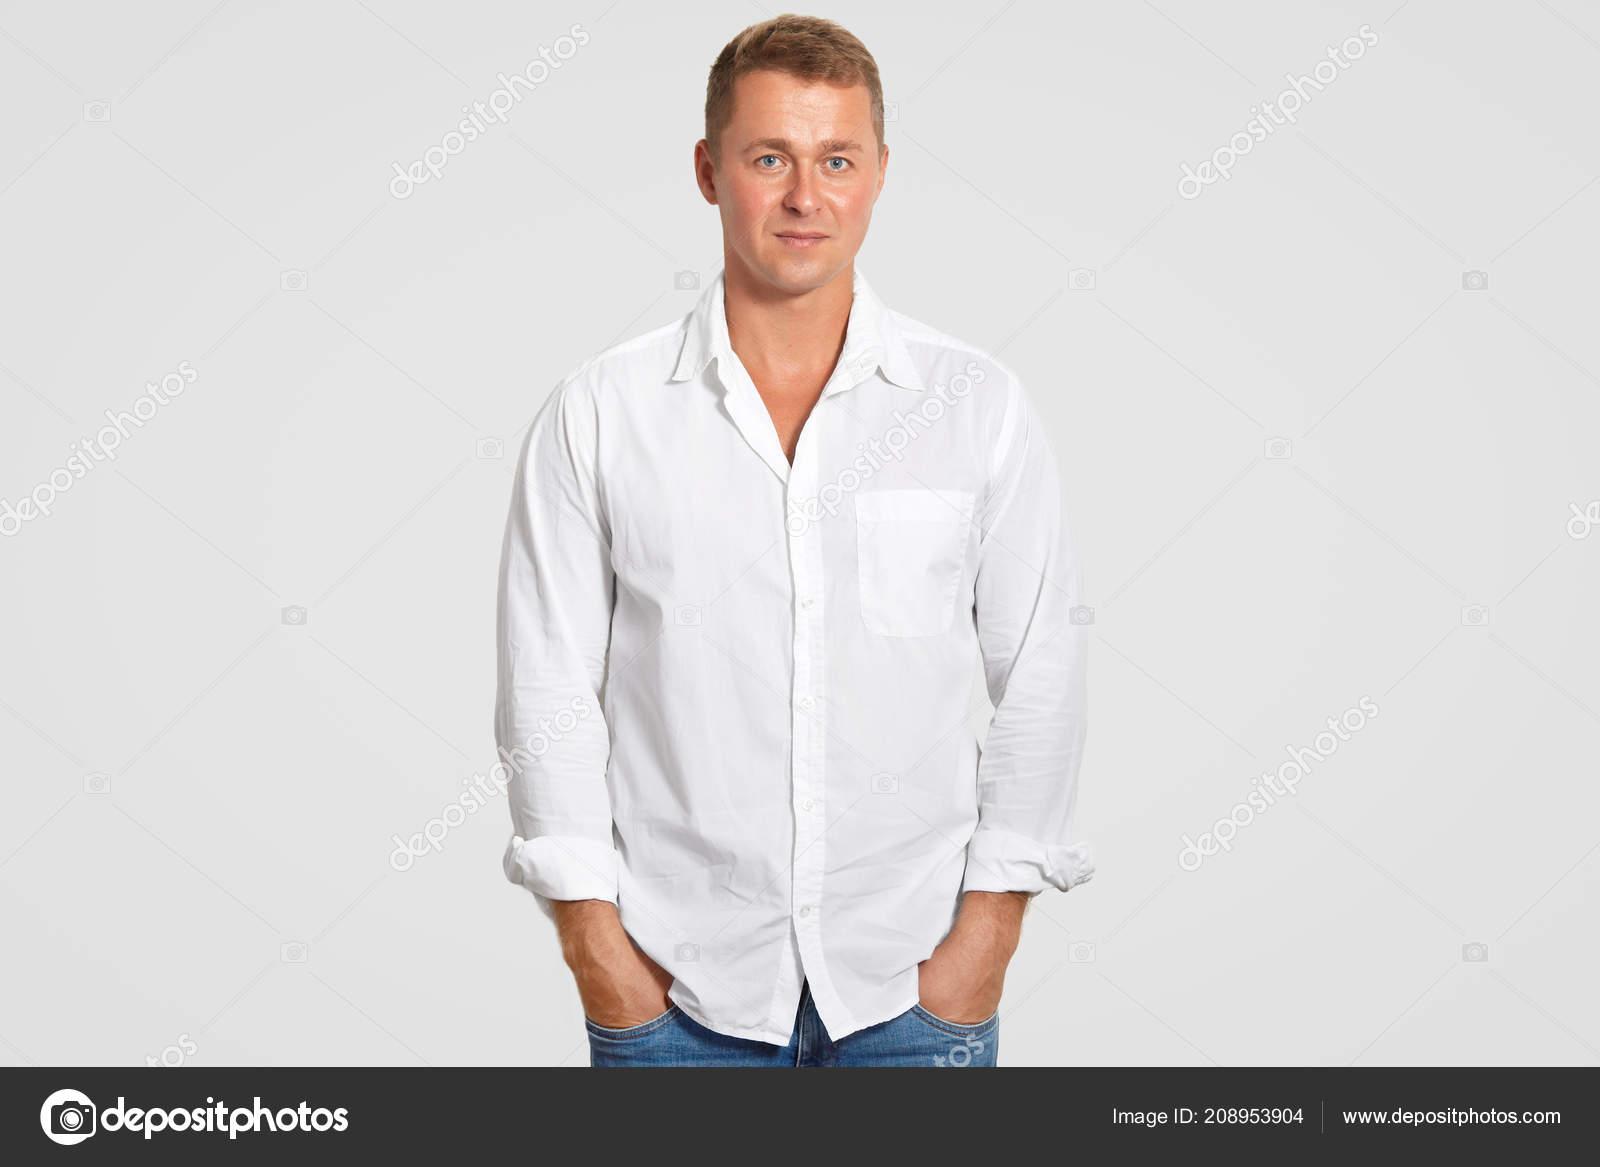 548c39054a6d Όμορφος Νεαρά Αρσενικά Στο Λευκό Πουκάμισο Κρατά Χέρια Στις Τσέπες —  Φωτογραφία Αρχείου